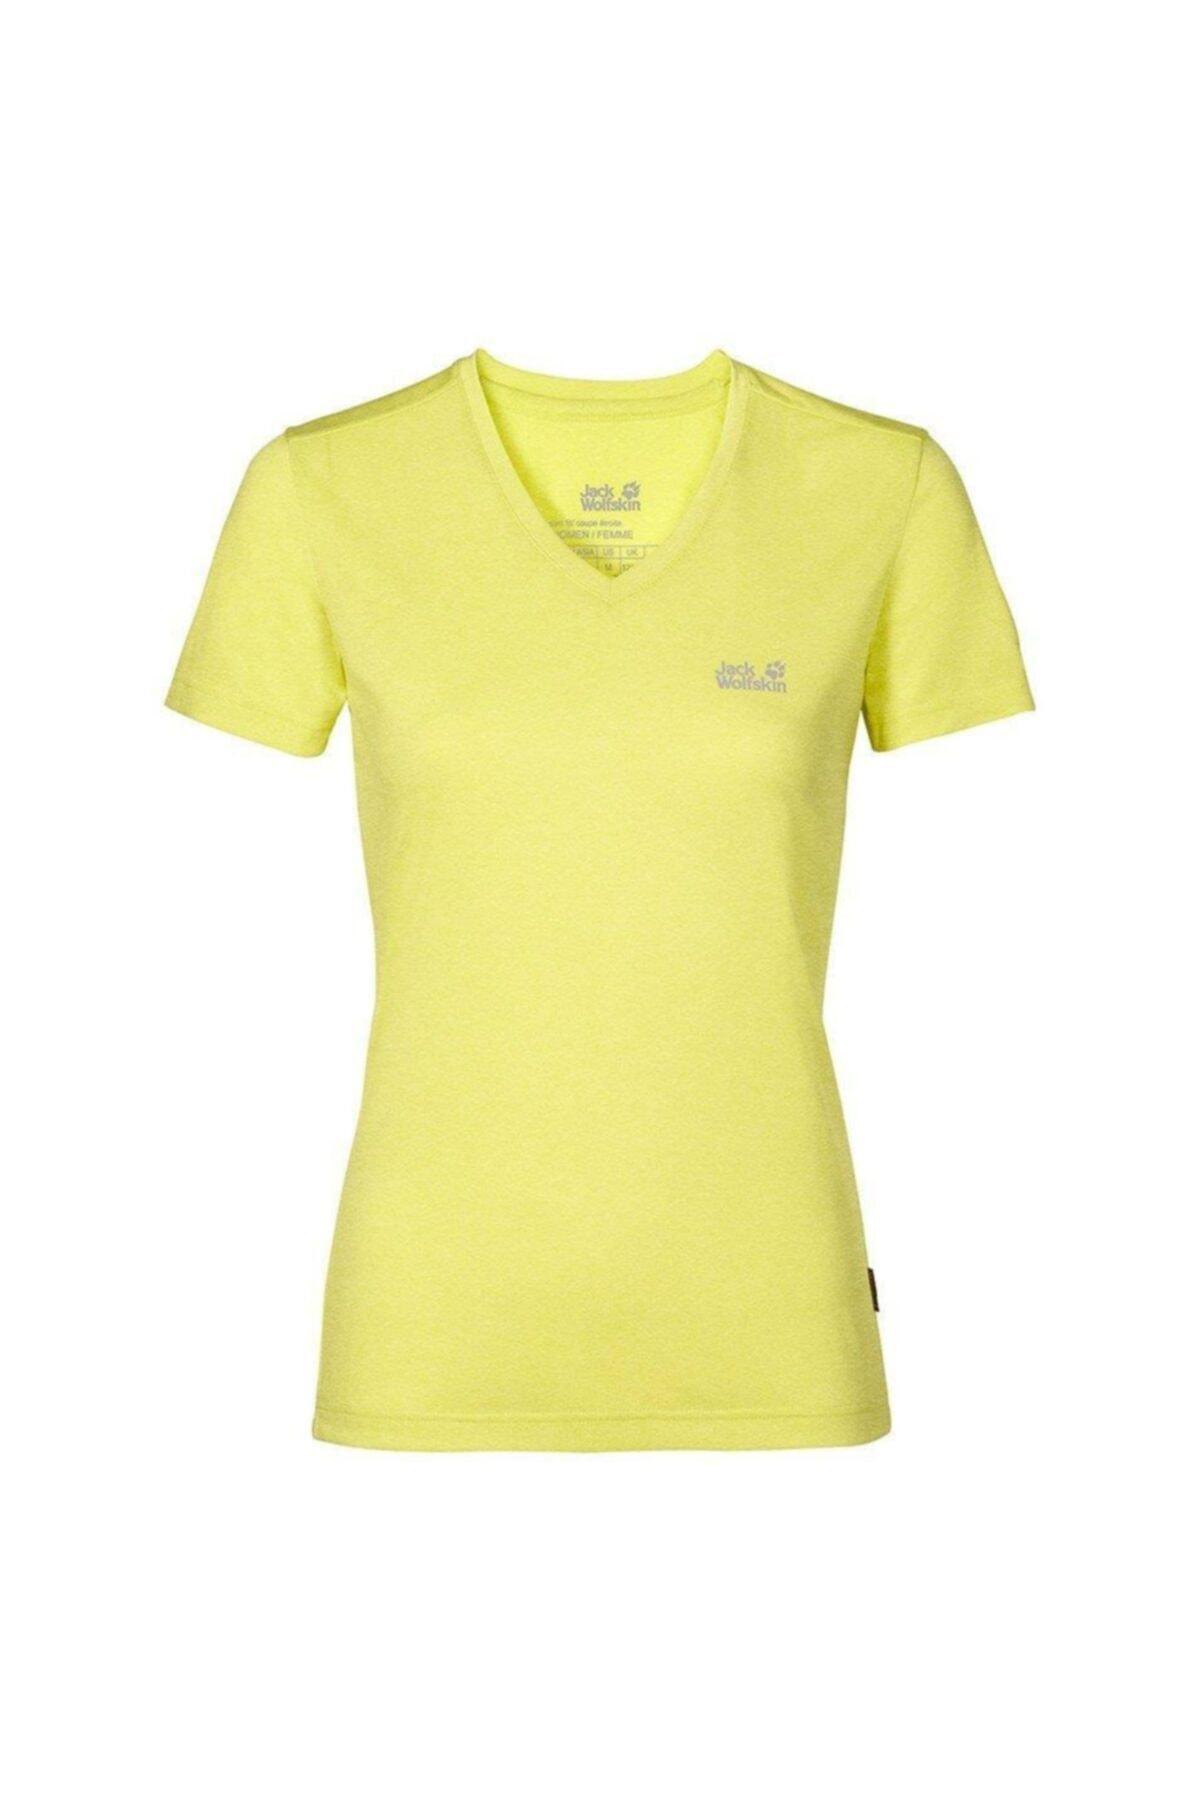 Jack Wolfskin Crosstrail Kadın T-shirt - 1801692-3075 1